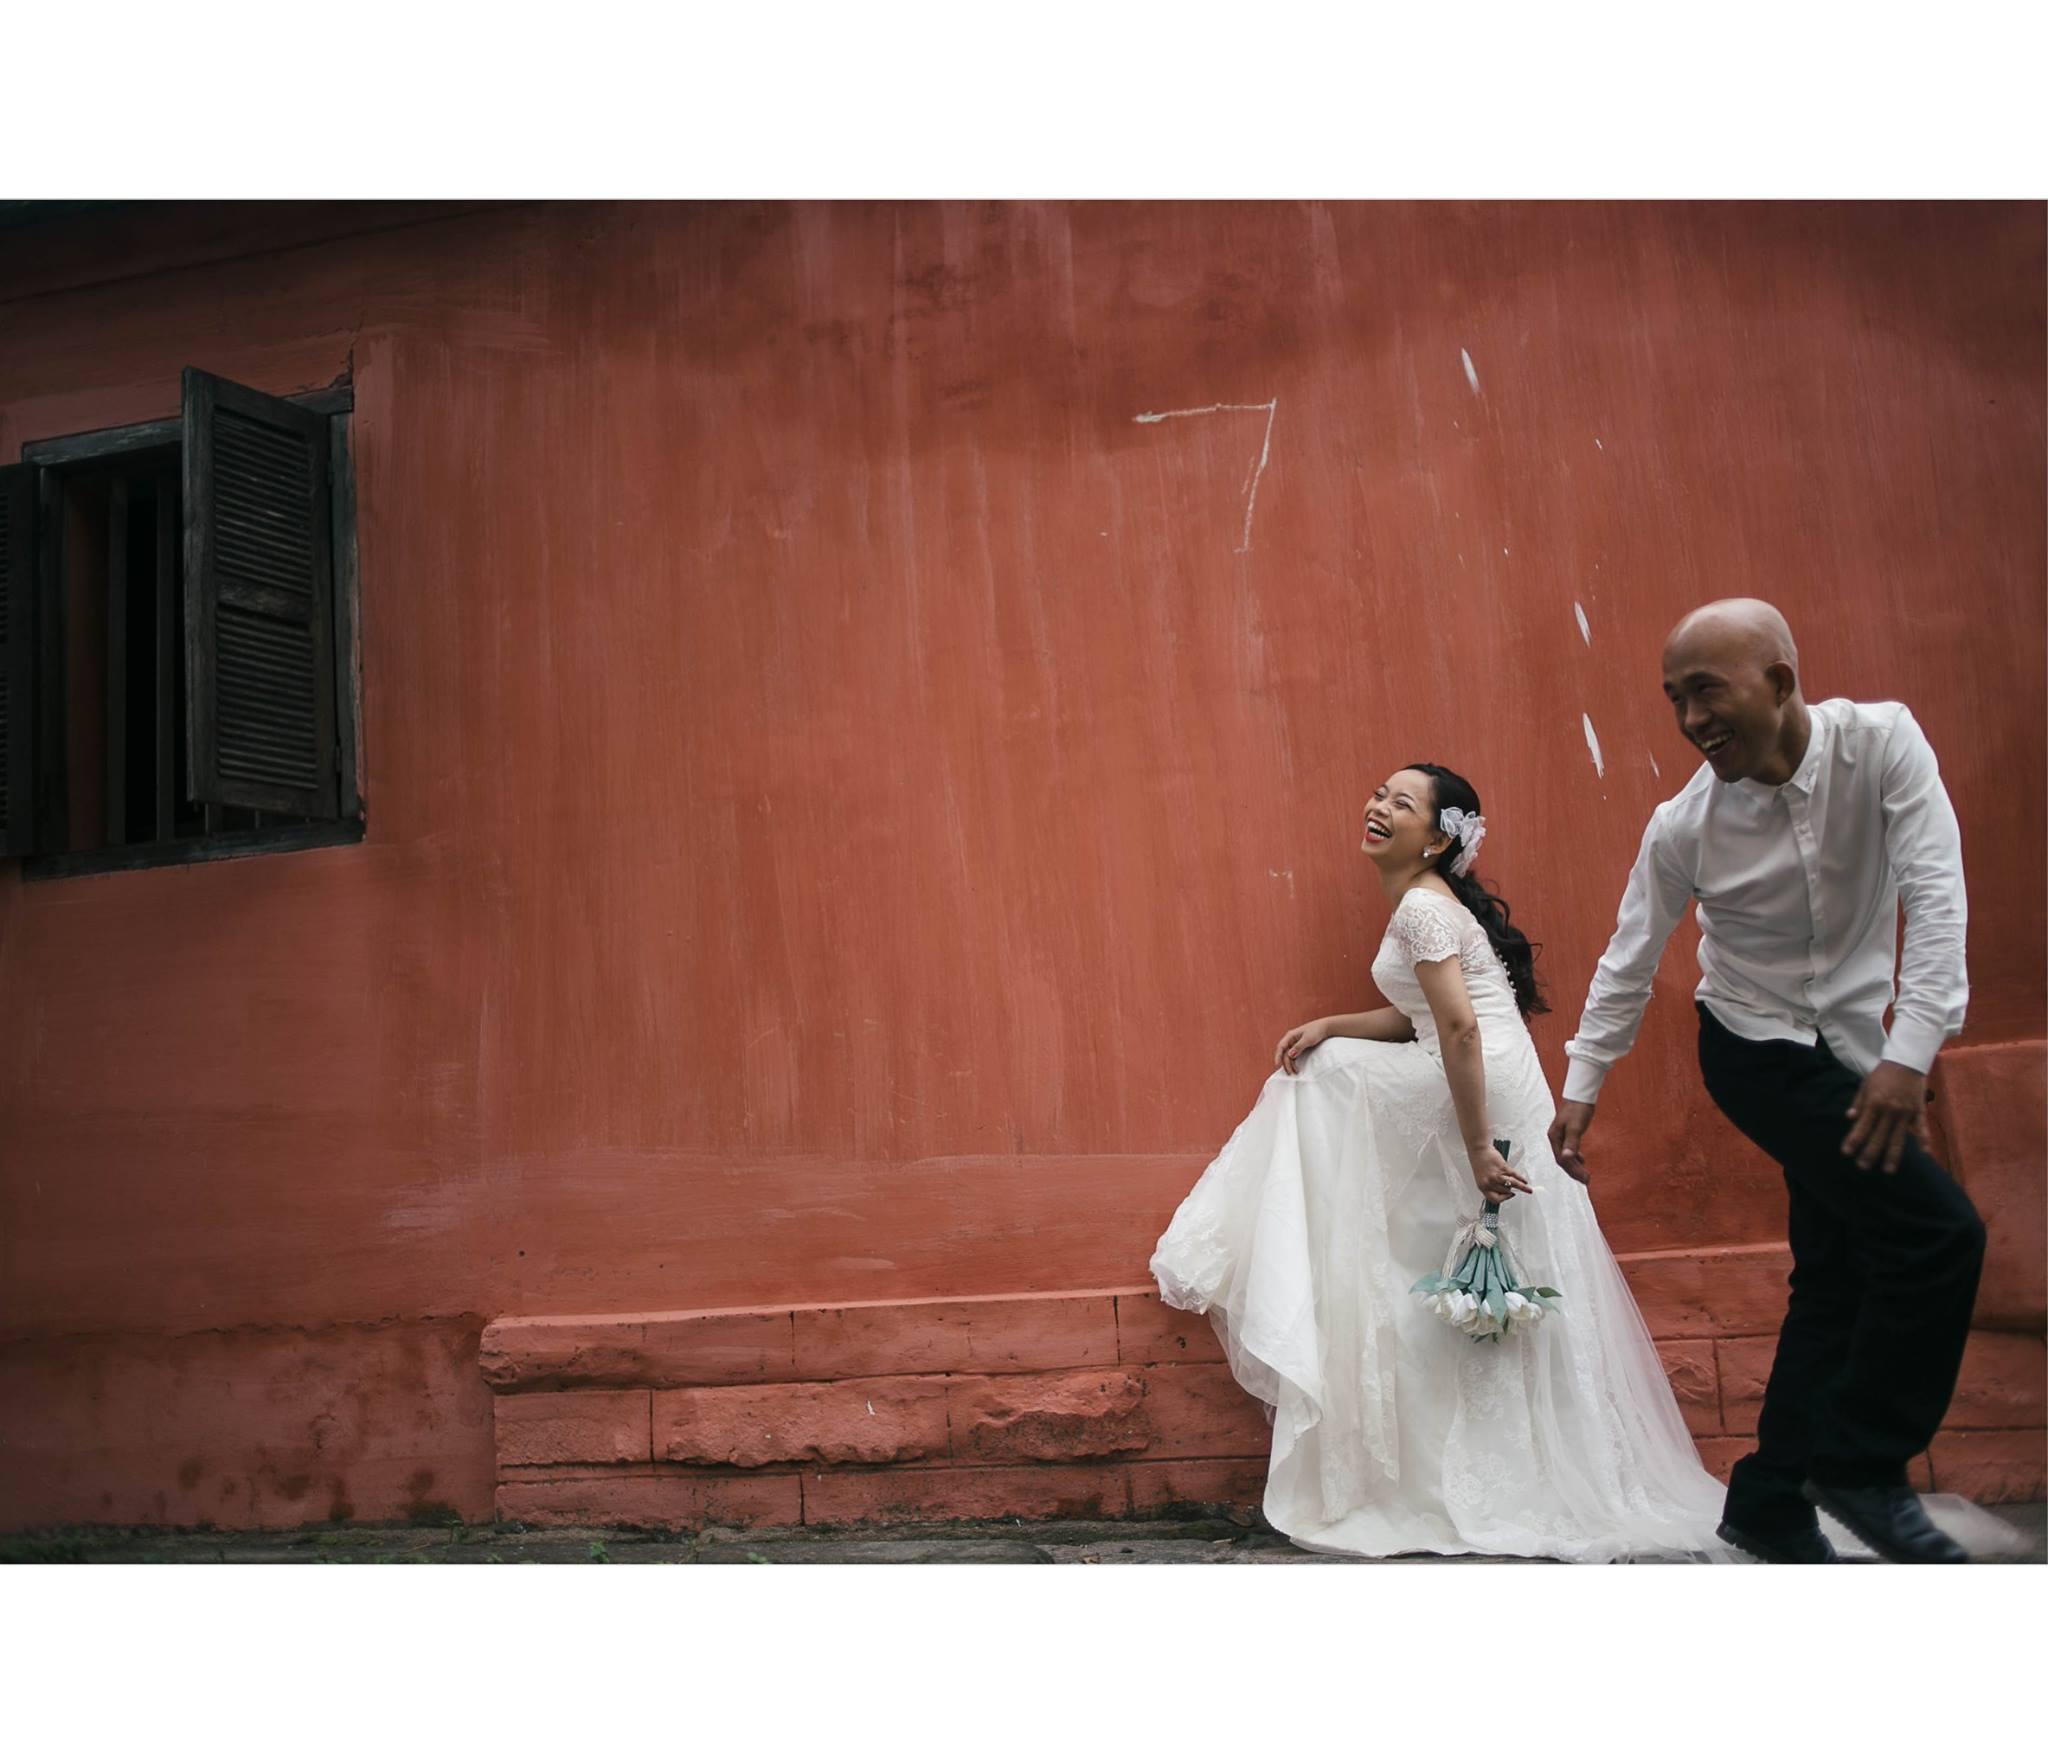 Danang-Hoi An-Wedding-Photography-141.jpg